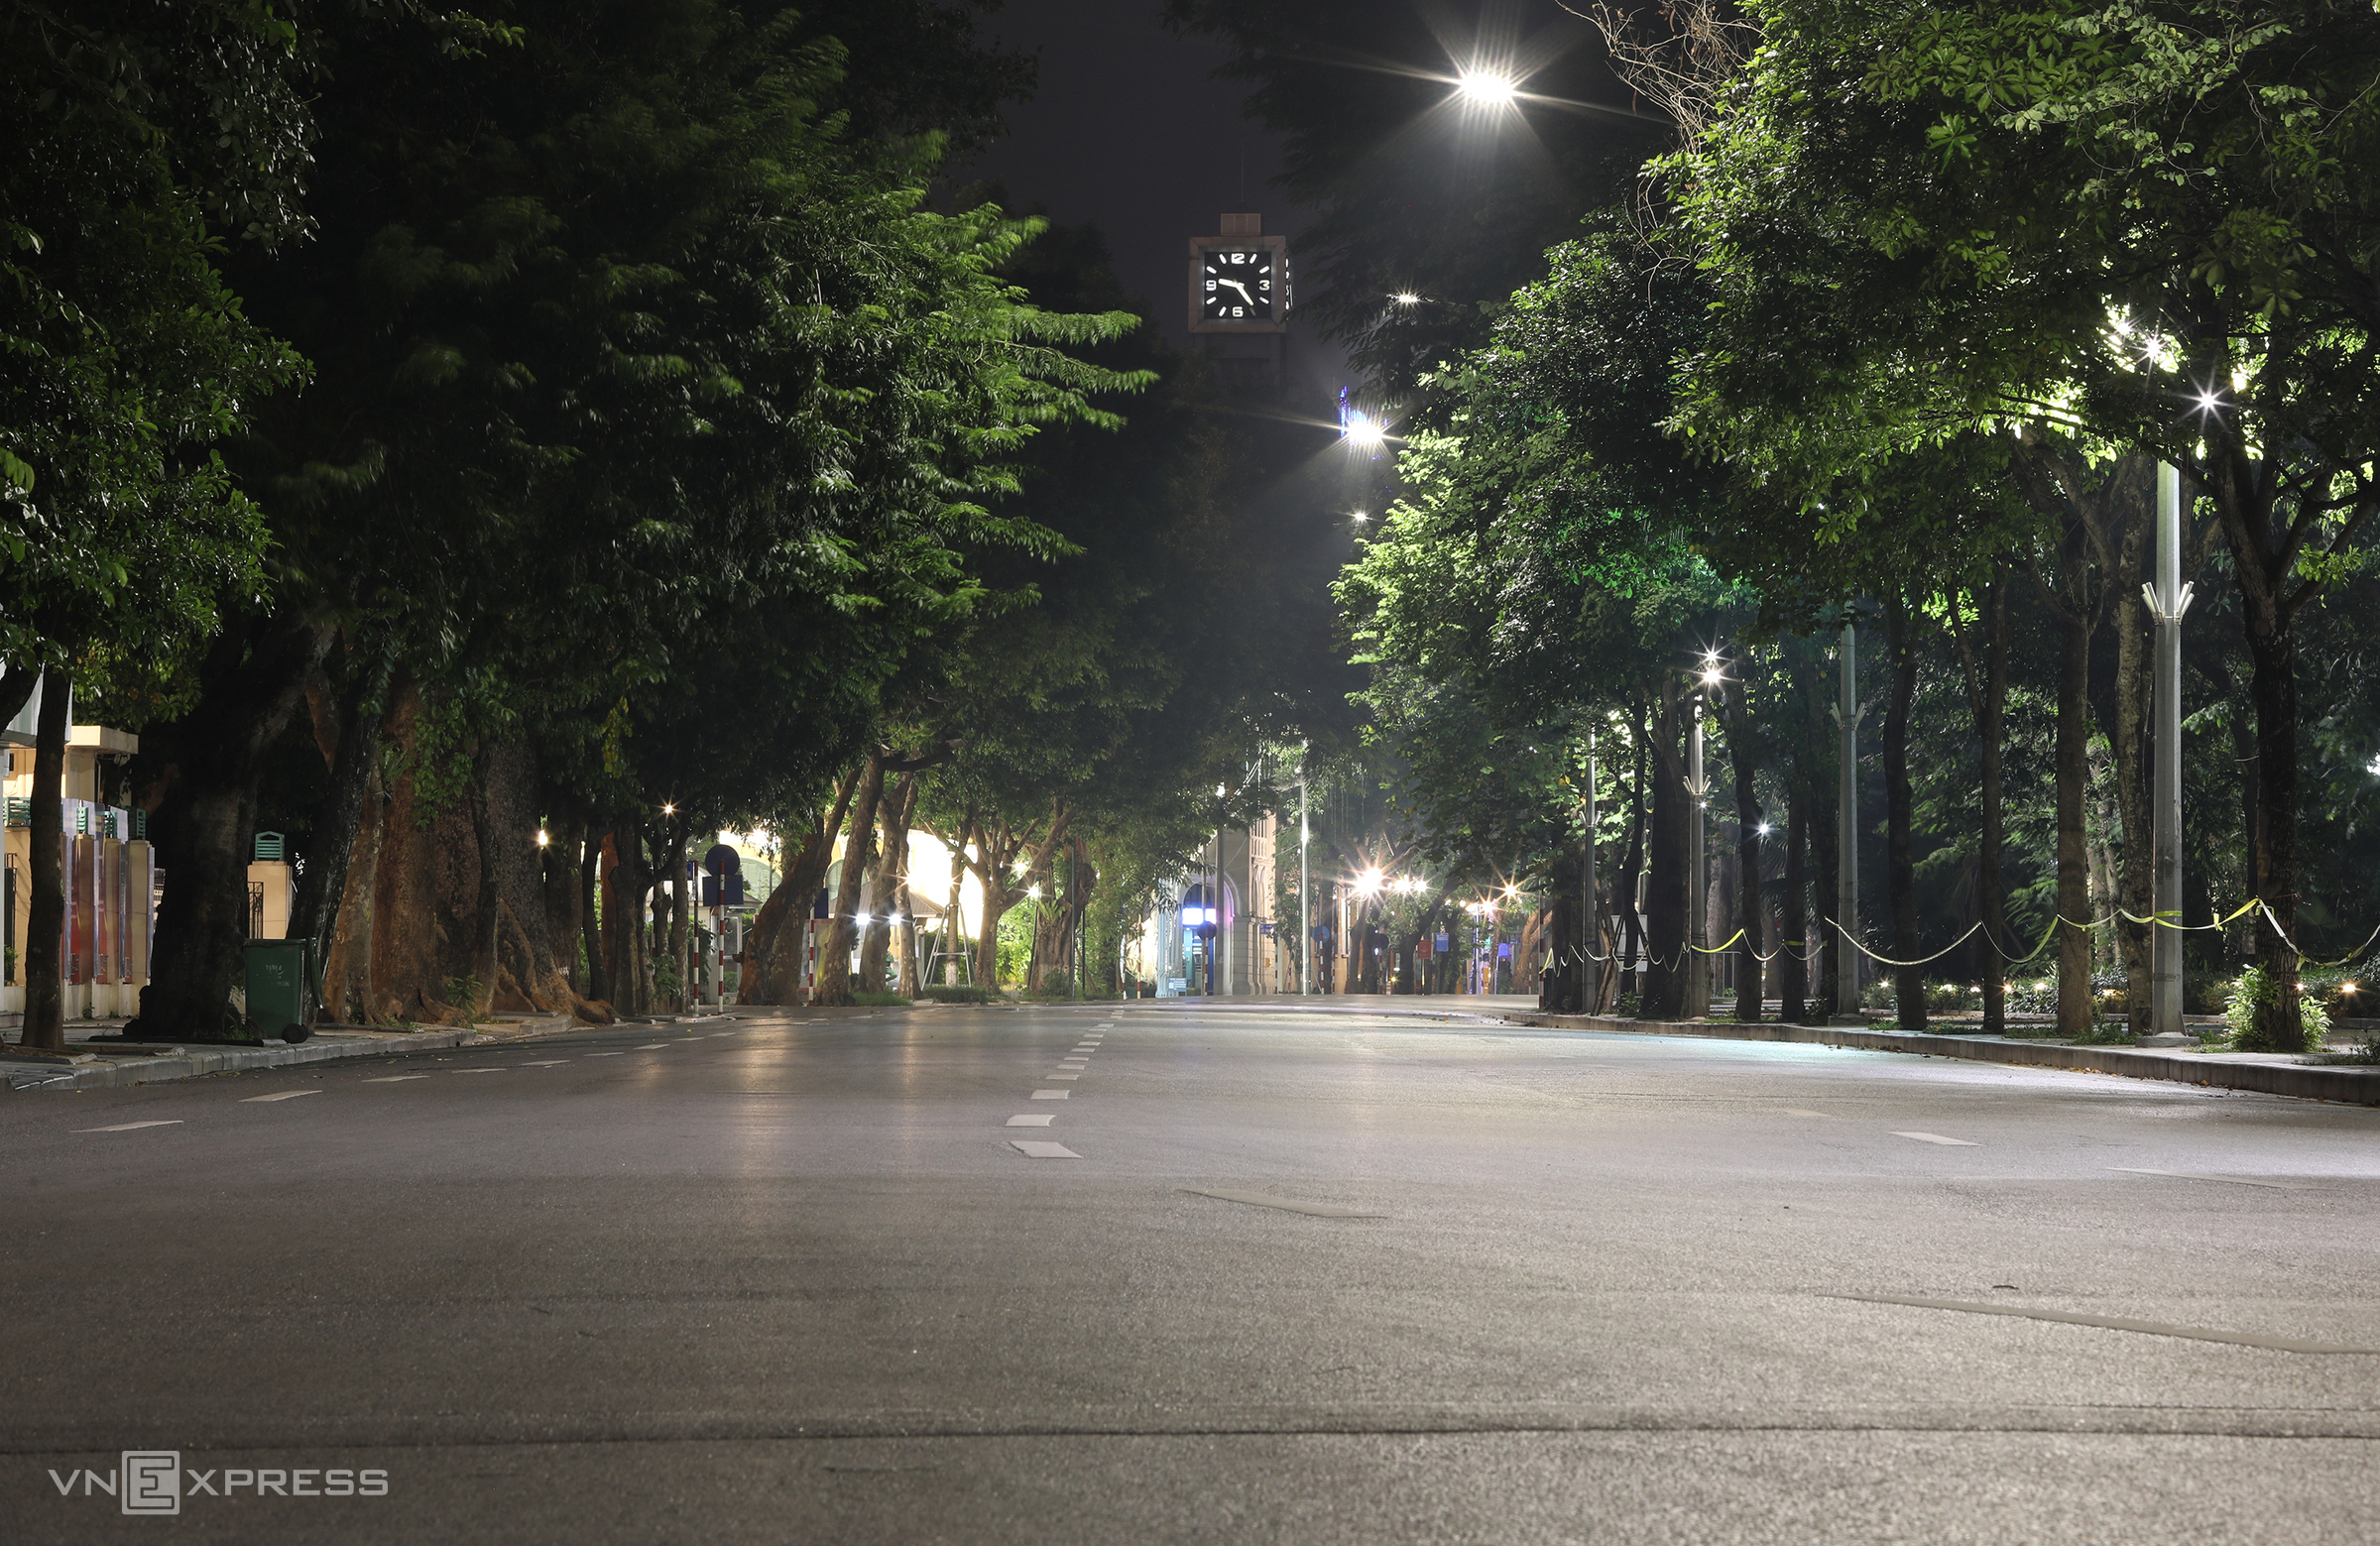 Hanoi calls it a night after sundown amid Covid restrictions